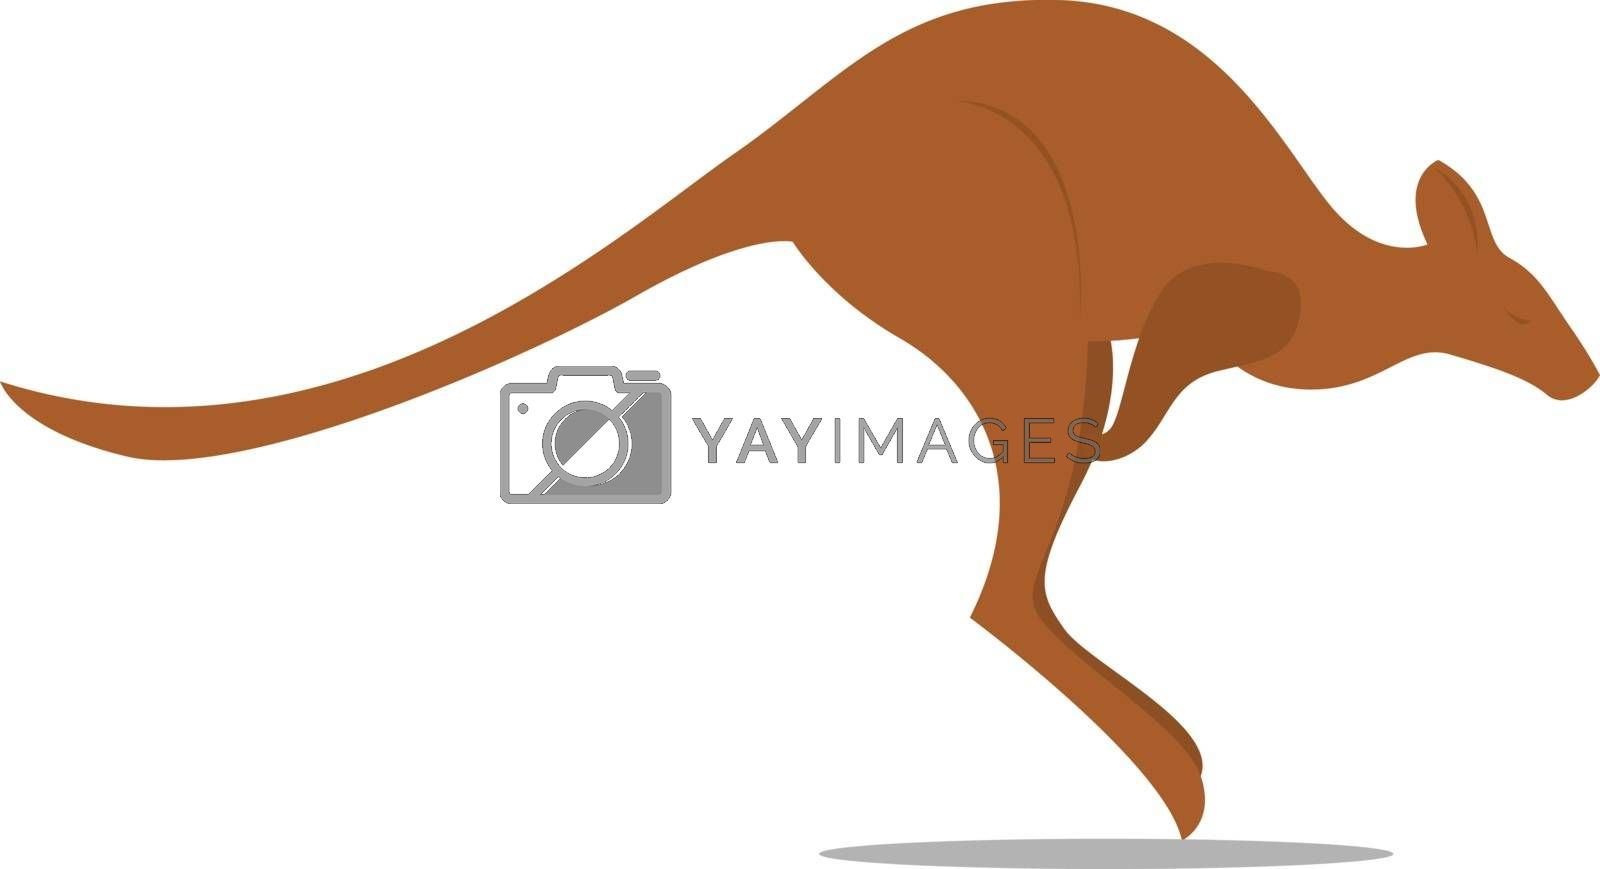 Kangaroo, illustration, vector on white background.